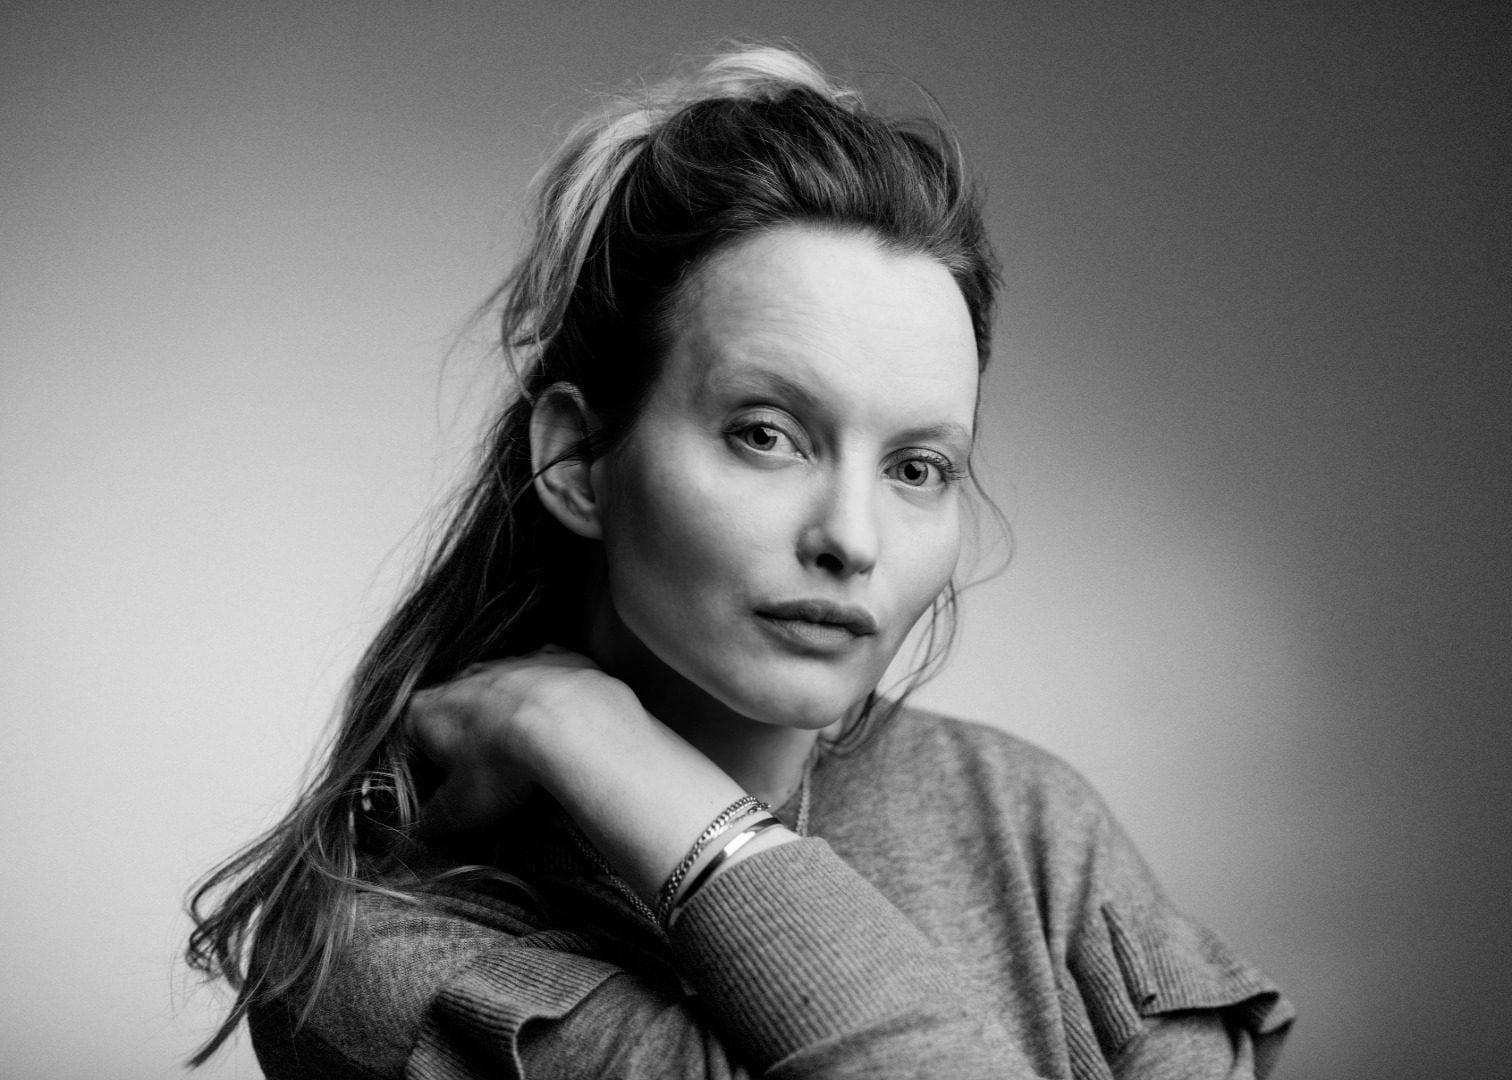 Anna Bache-Wiig Nude Photos 54